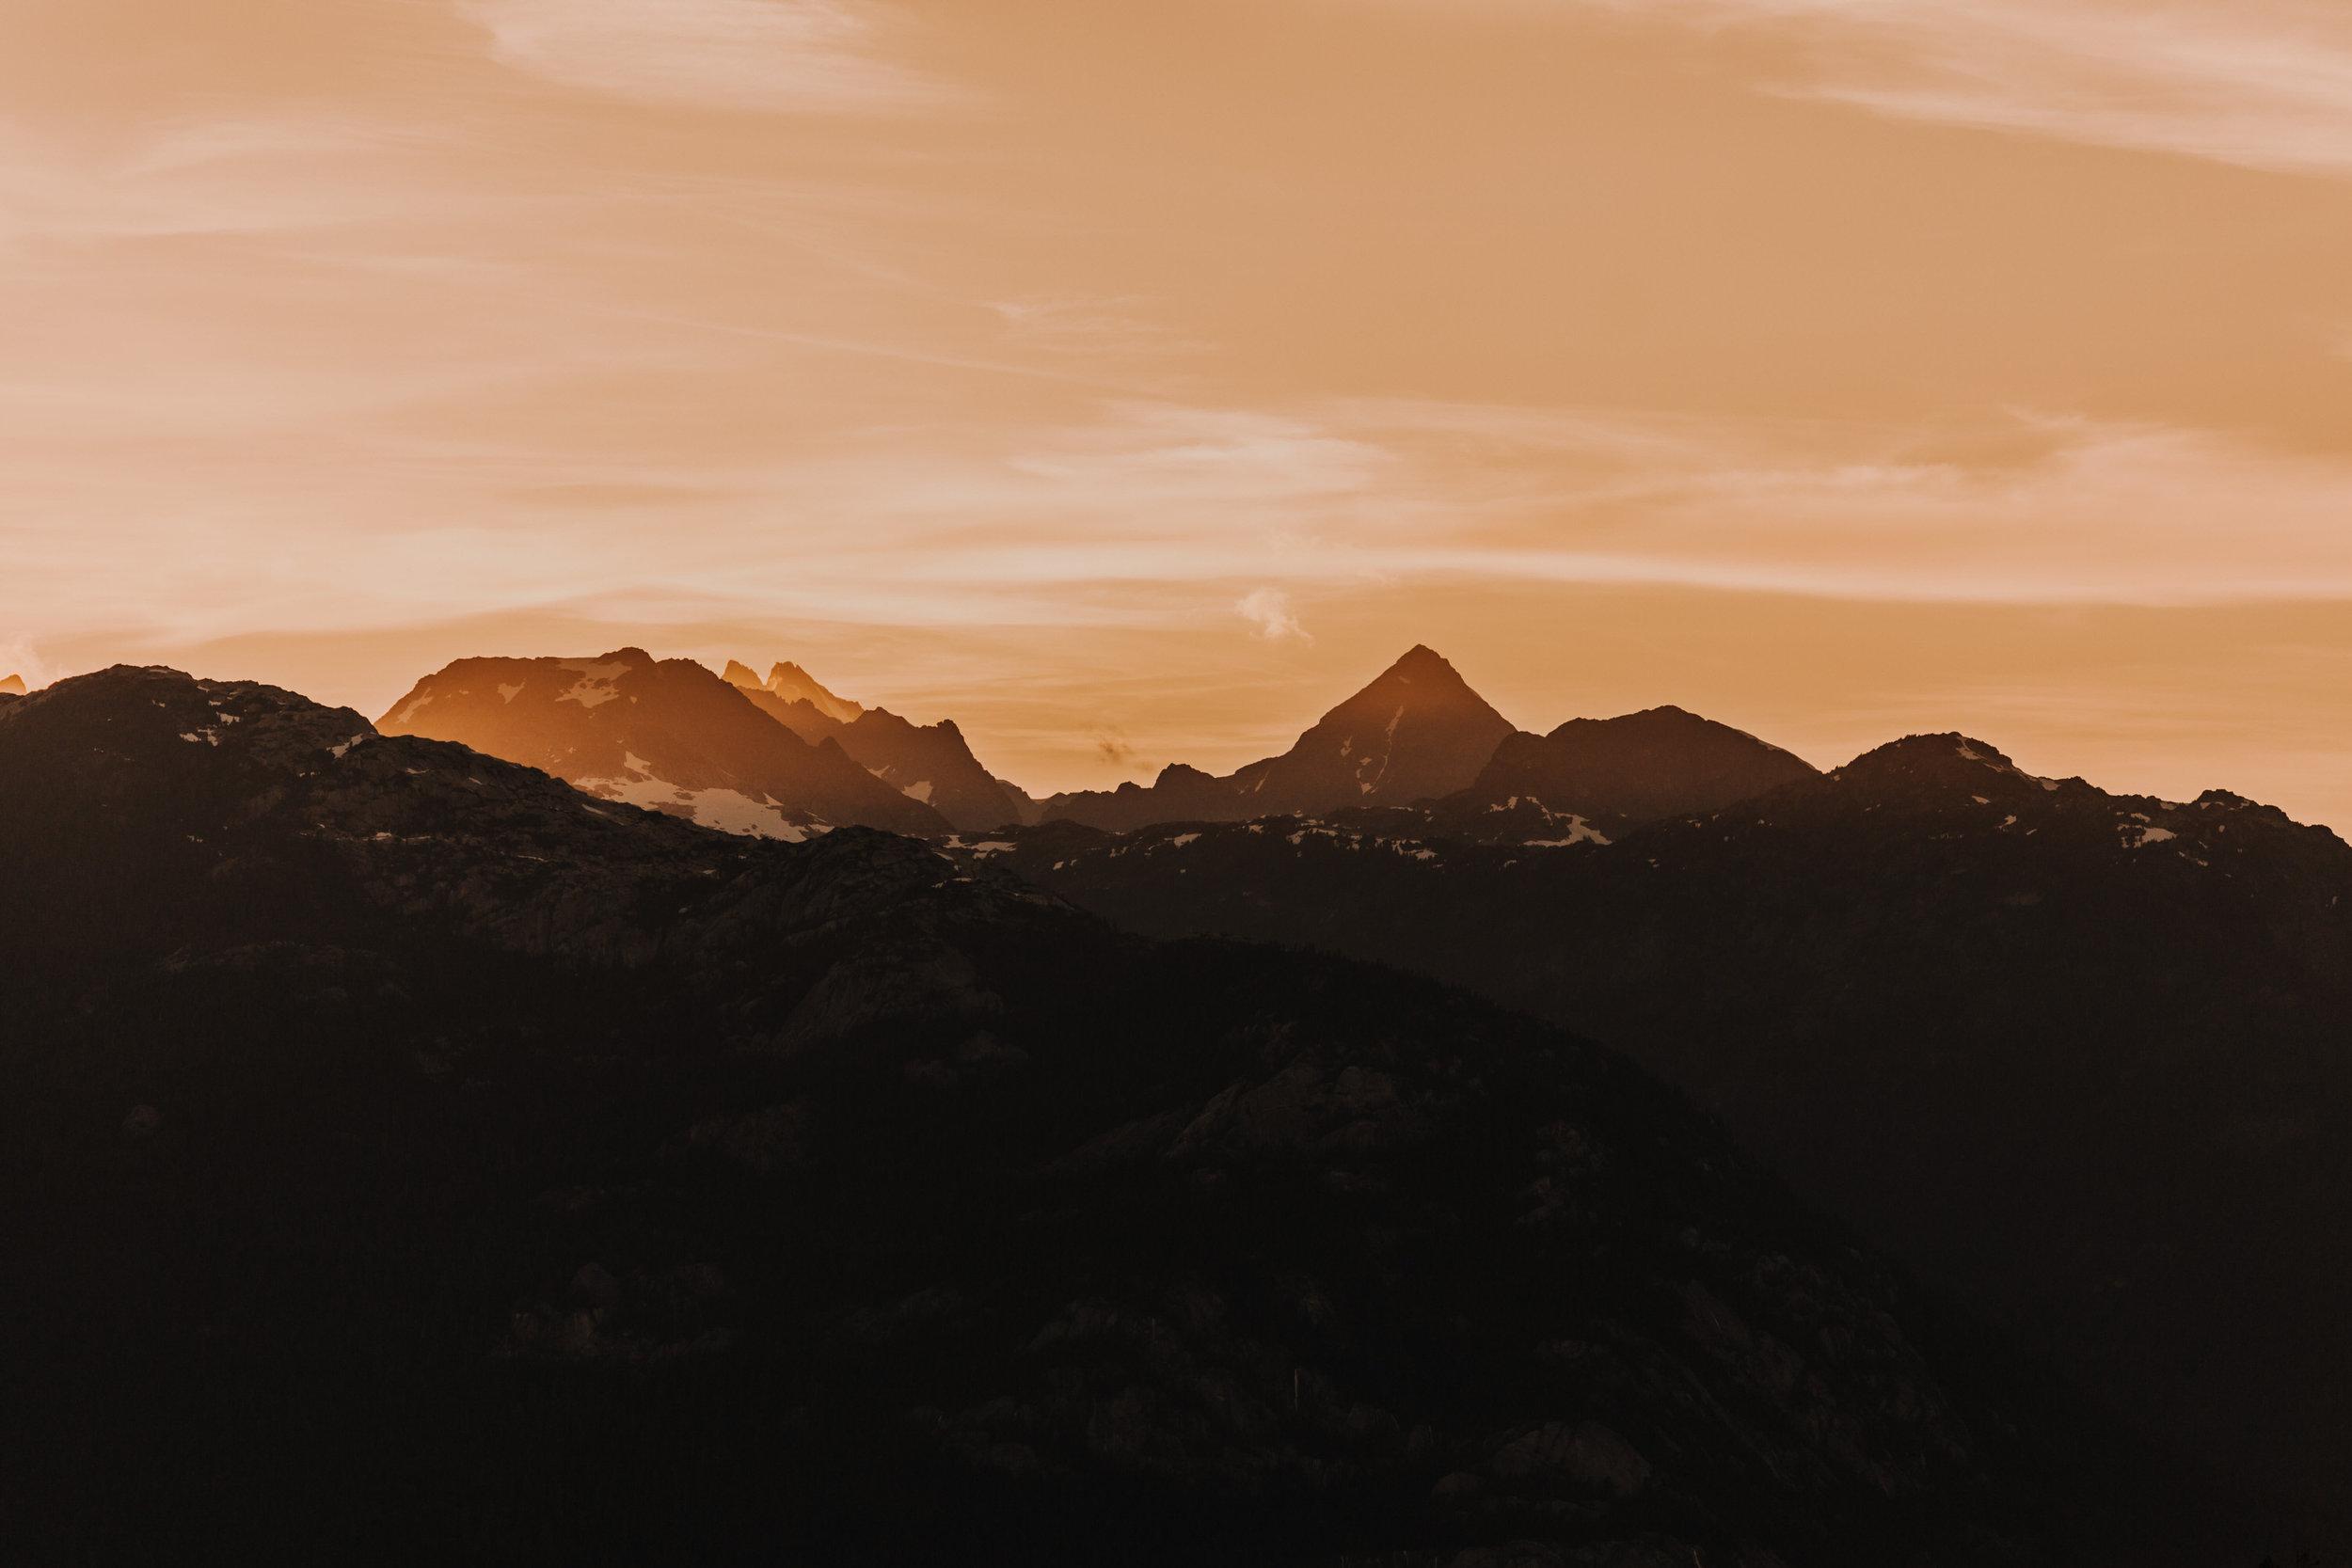 Squamish Wedding Photographer - Sea to Sky Gondola Wedding Photos -  Vancouver Wedding Photographer & Videographer - Sunshine Coast Wedding Photos - Sunshine Coast Wedding Photographer - Jennifer Picard Photography - IMG_0766.jpg